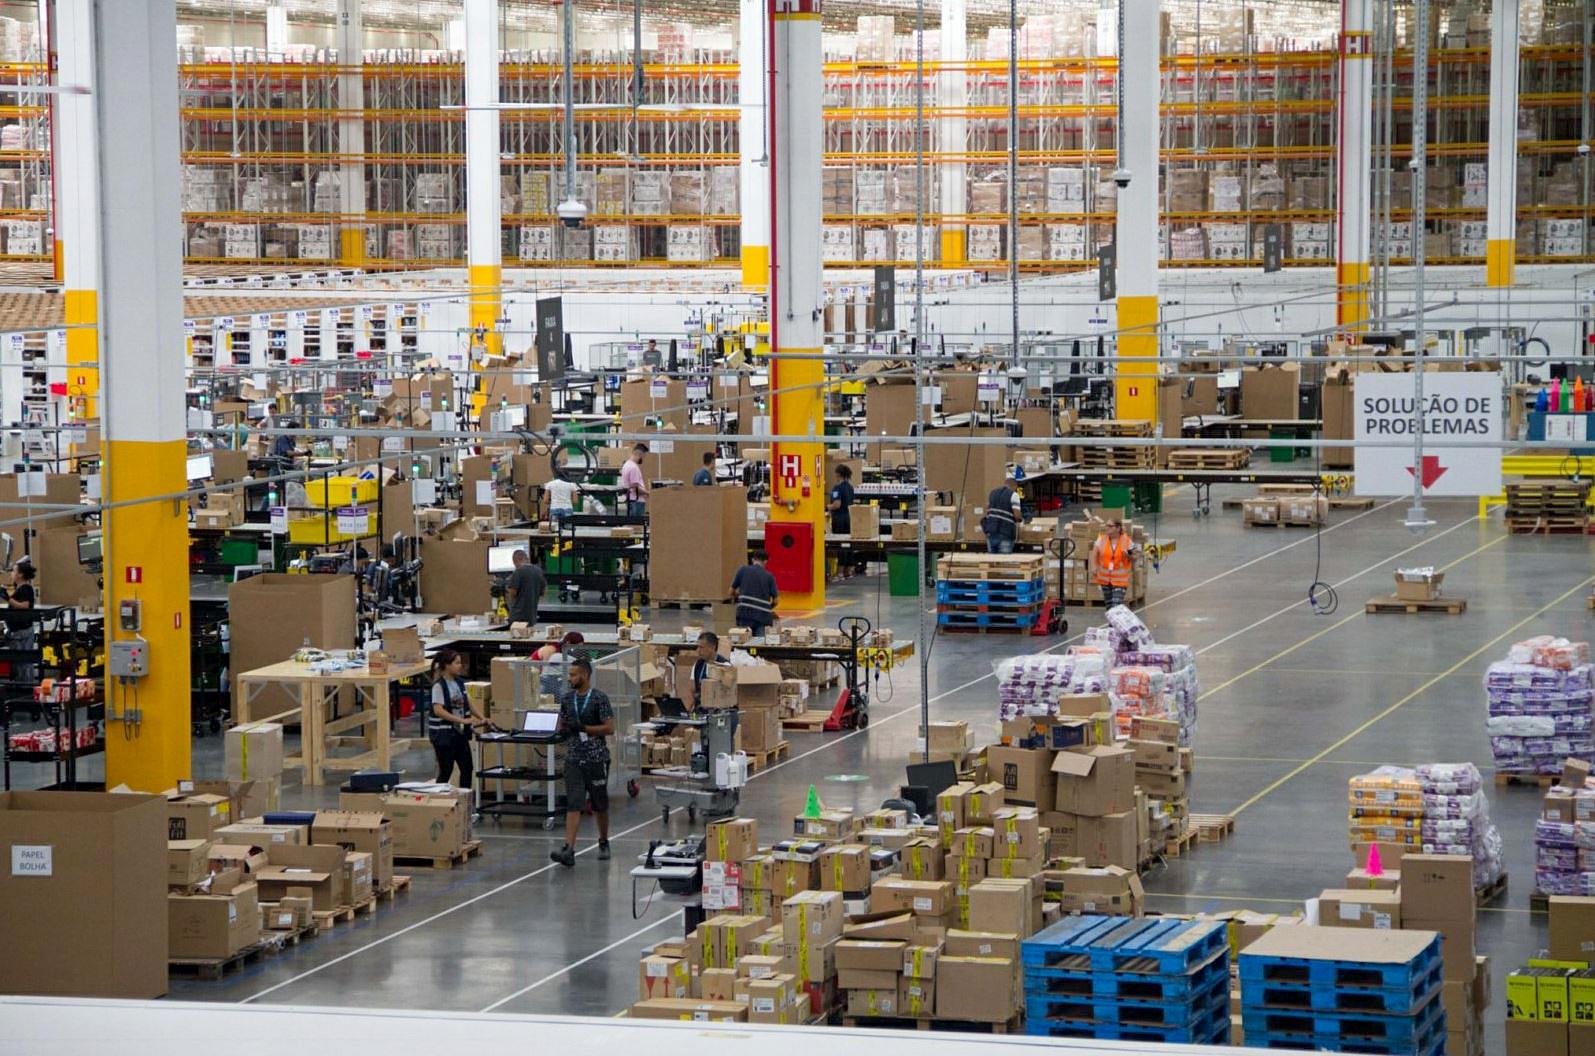 Sorry Bezos, Brazil Already Has an Amazon. It's MercadoLibre - Bloomberg